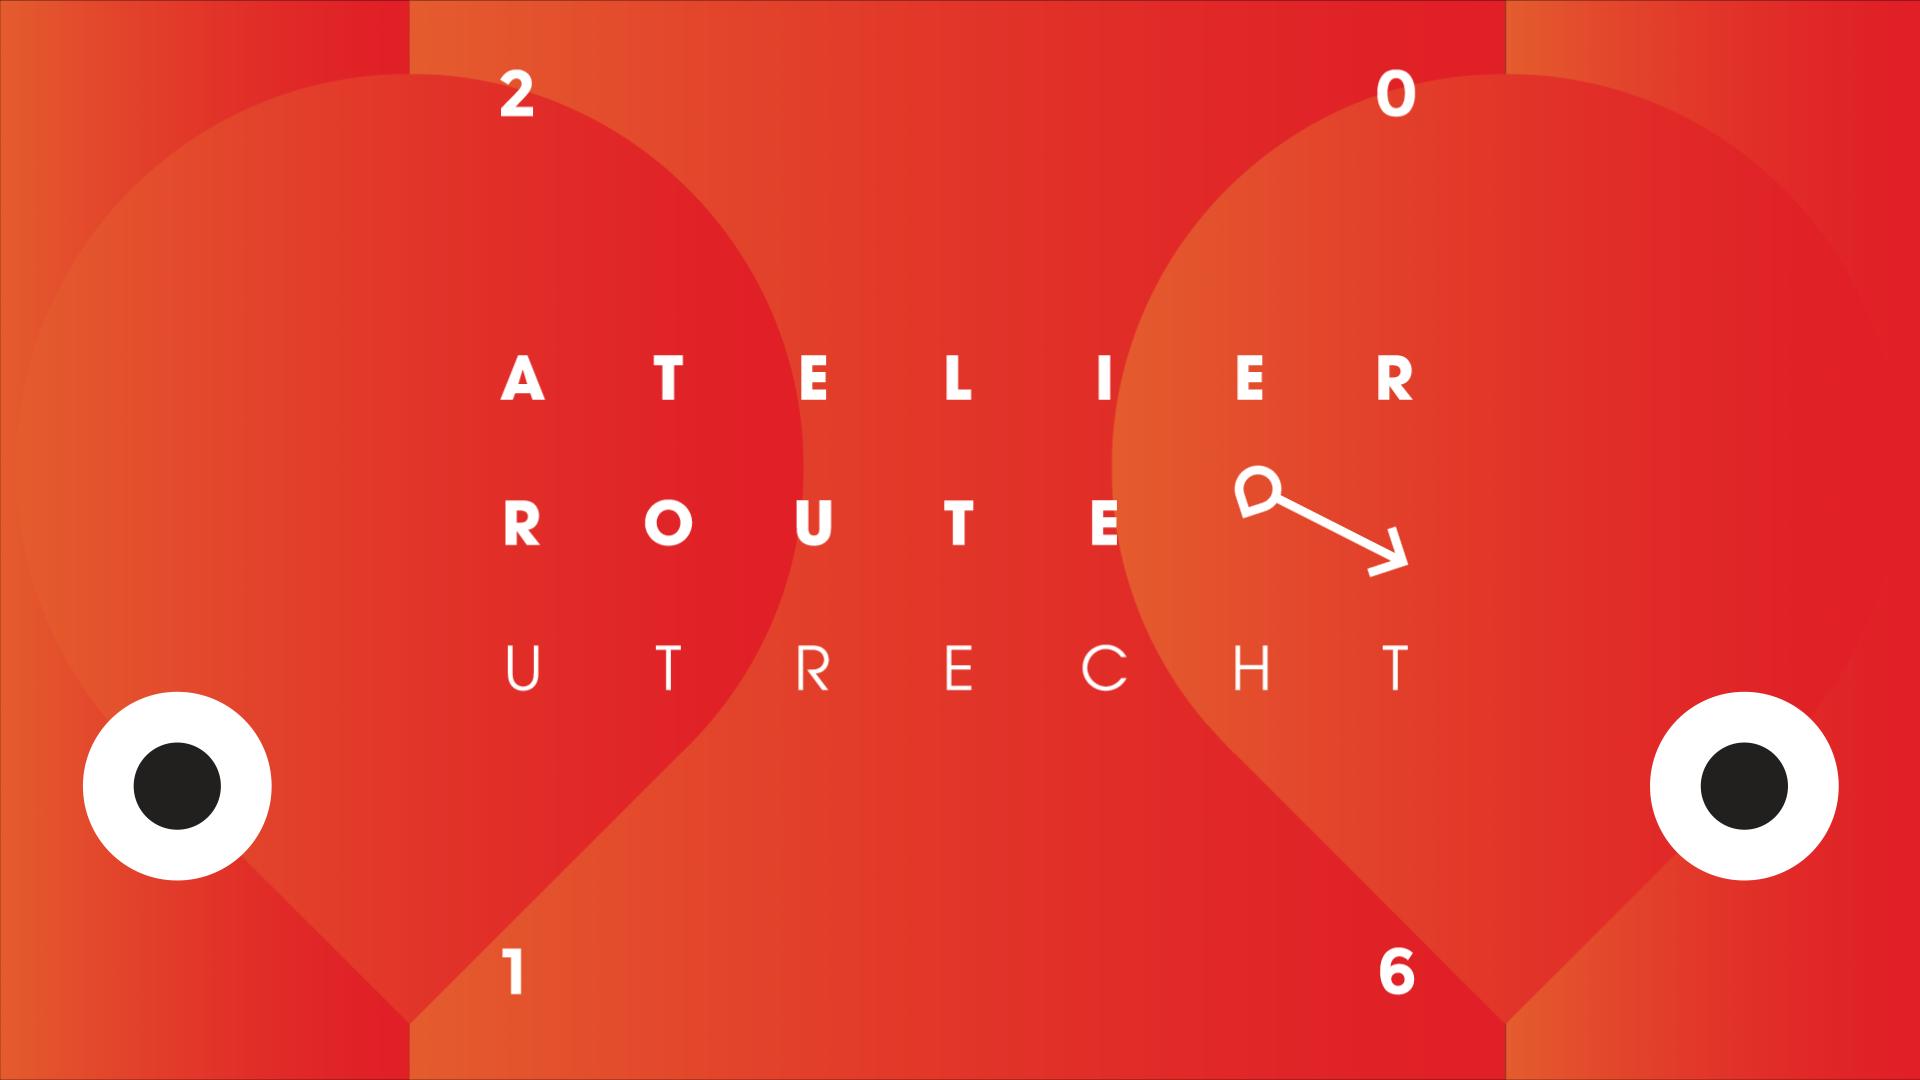 Atelierroute Utrecht trailer 2016